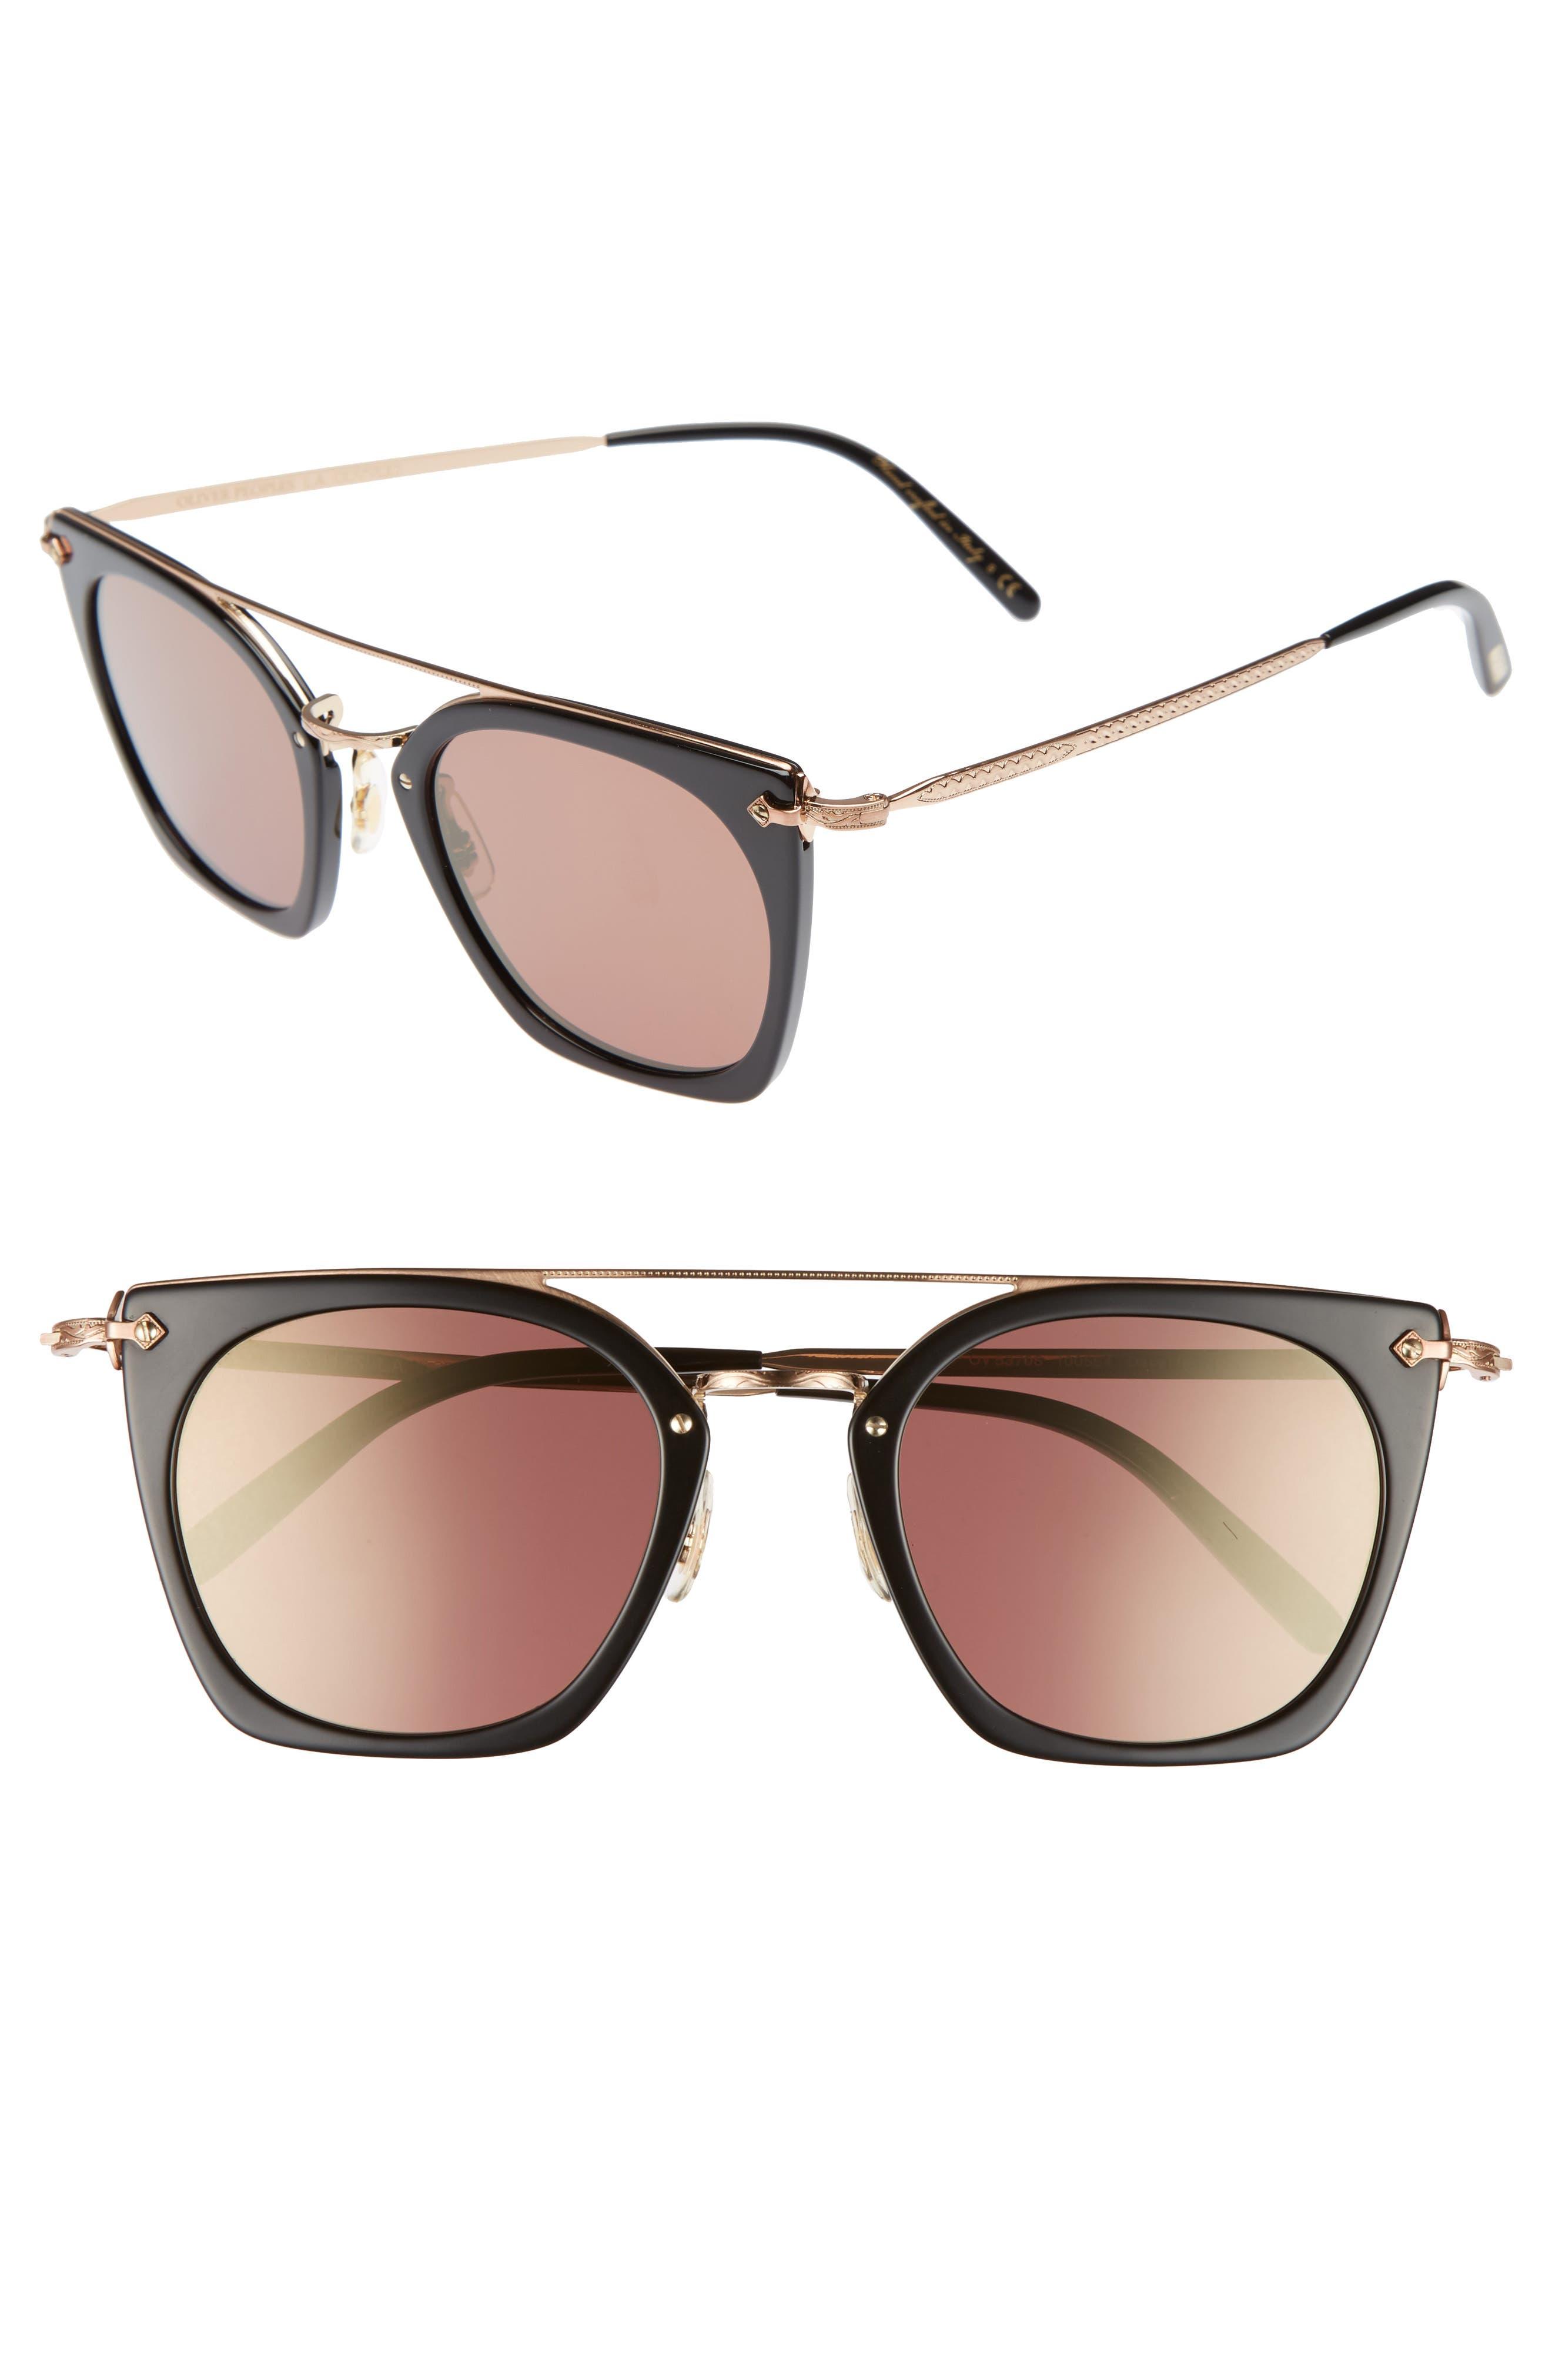 Dacette 50mm Square Aviator Sunglasses,                         Main,                         color, BLACK/ ROSE GOLD